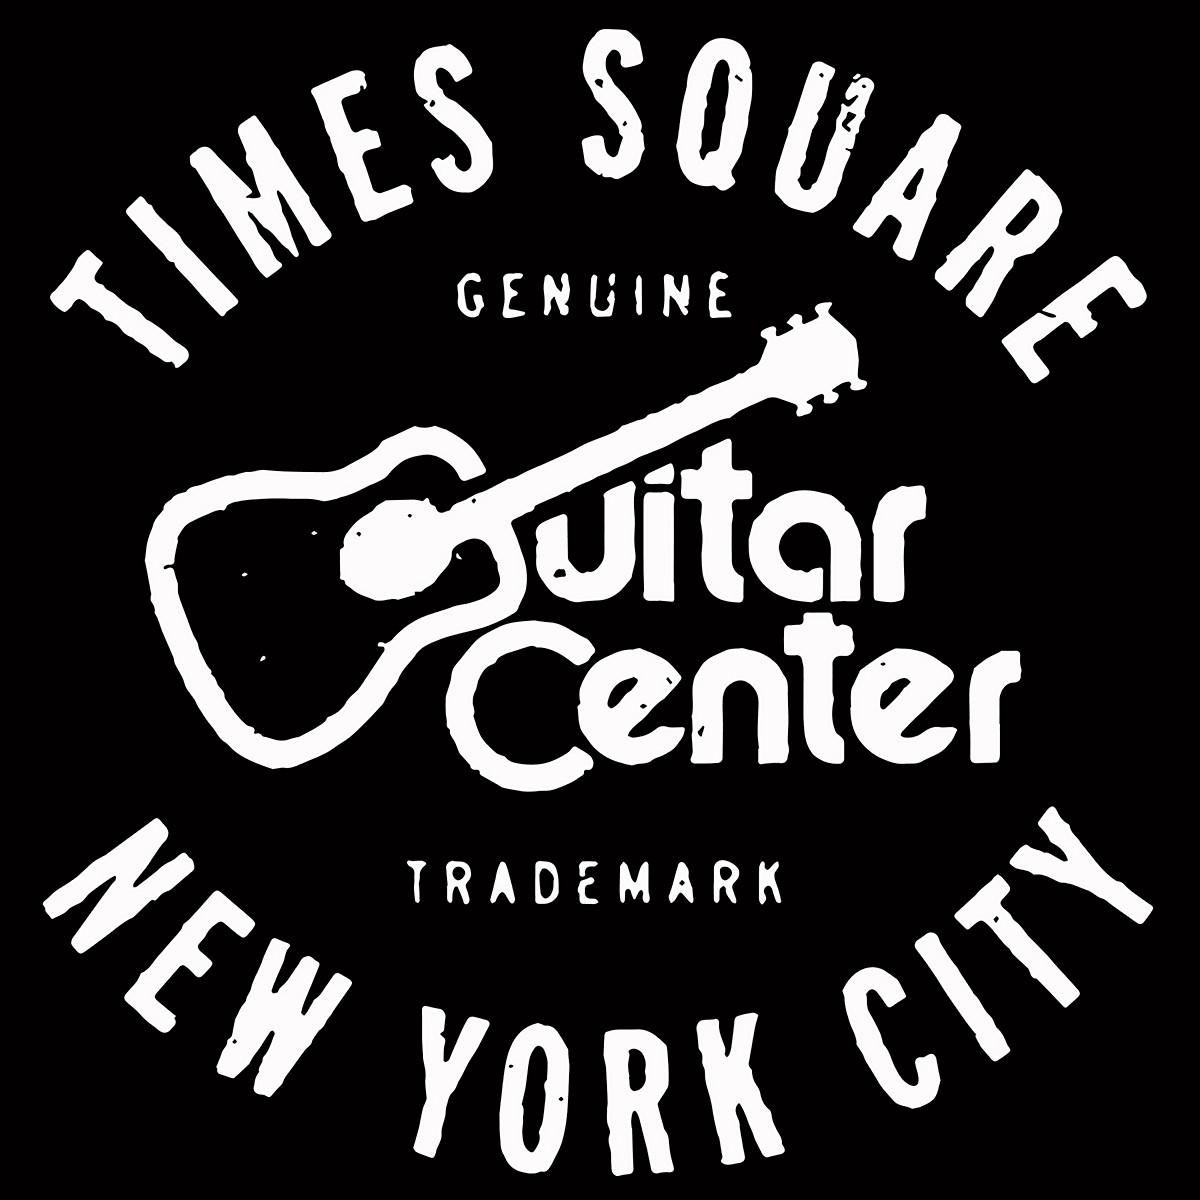 Guitar Center New York City and Times Square GO - White/Black Sticker